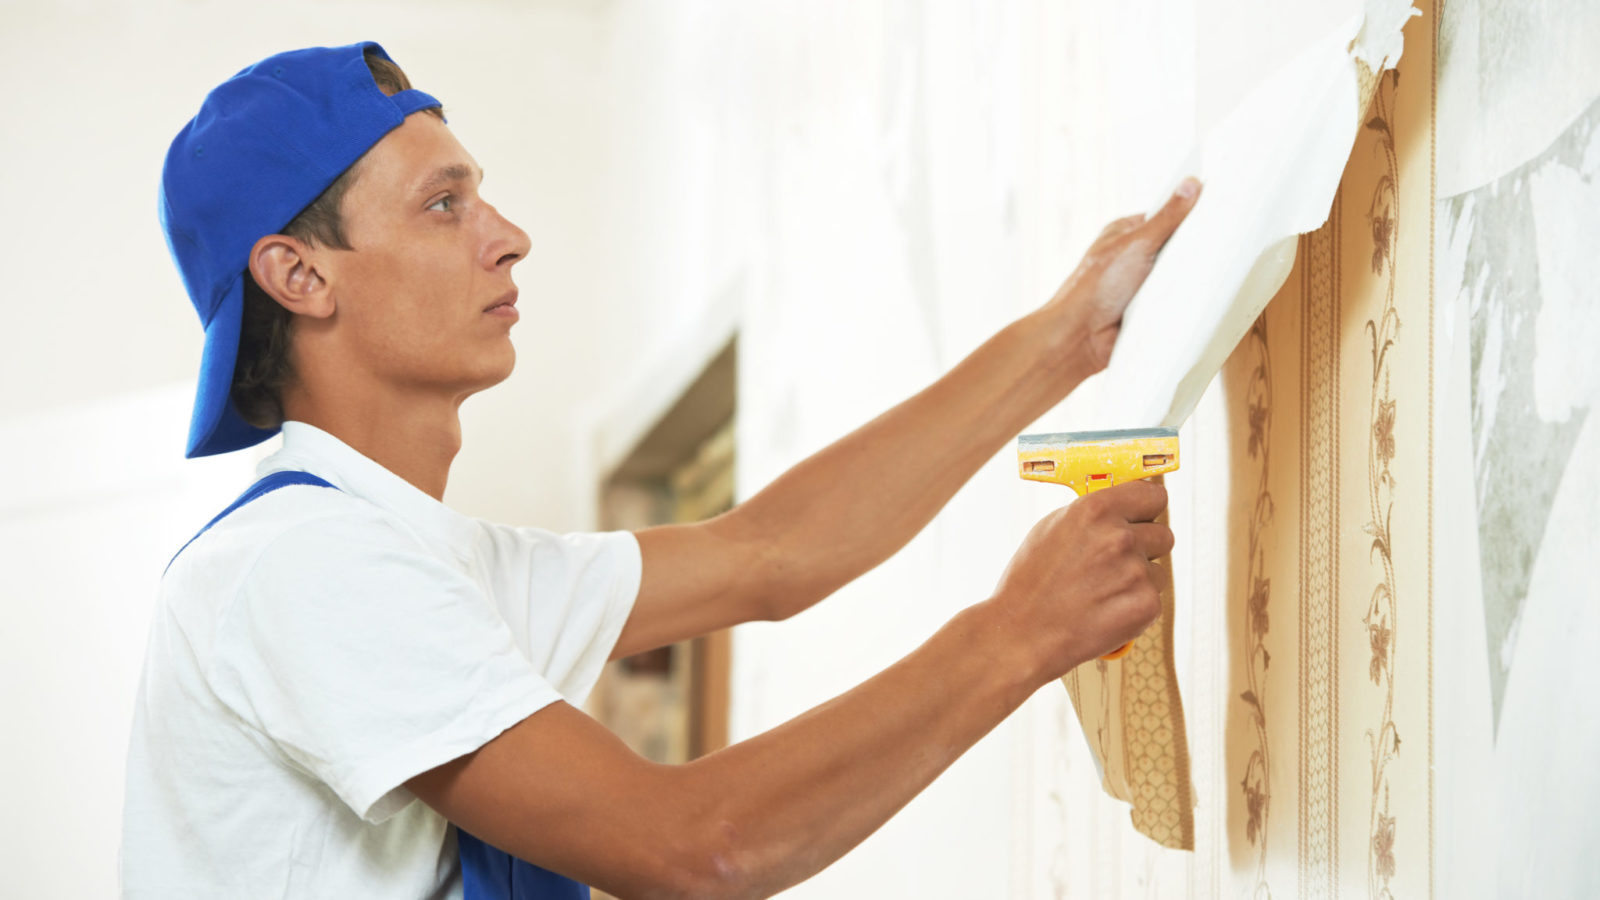 Homeowner peeling wallpaper from a wall